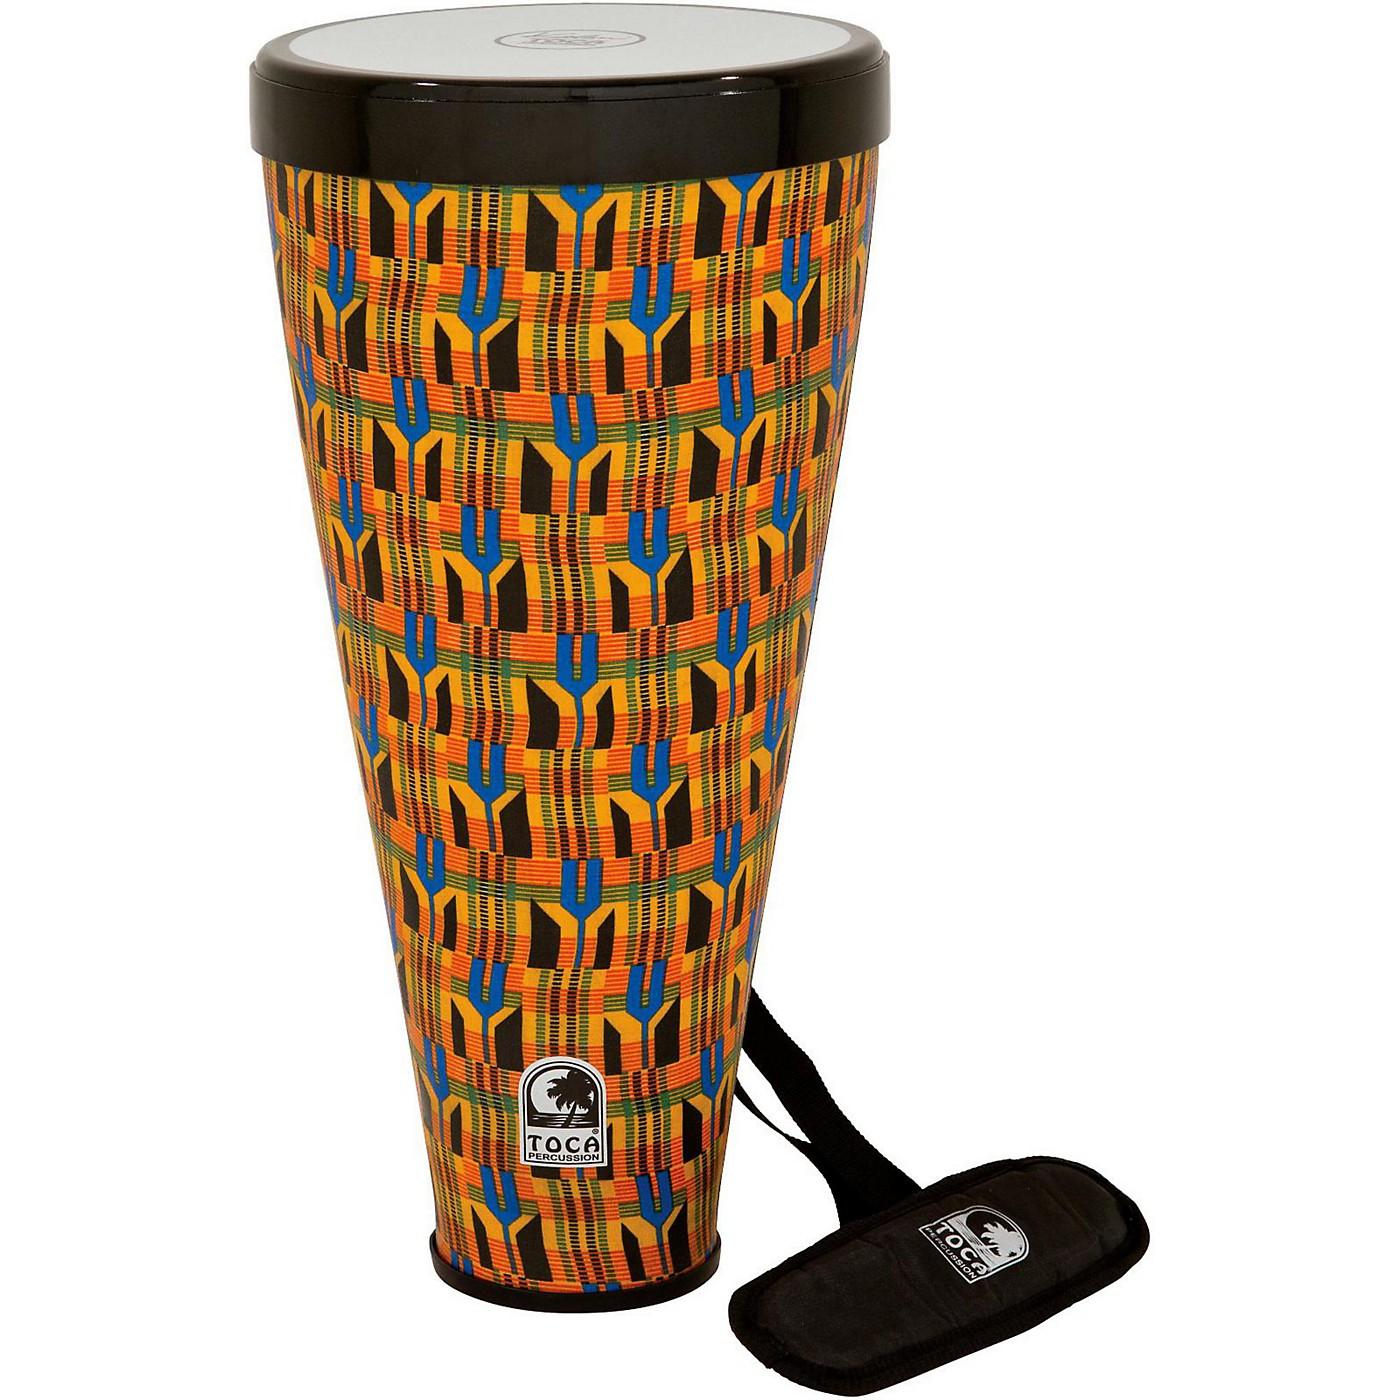 Toca Flex Drum with Strap thumbnail